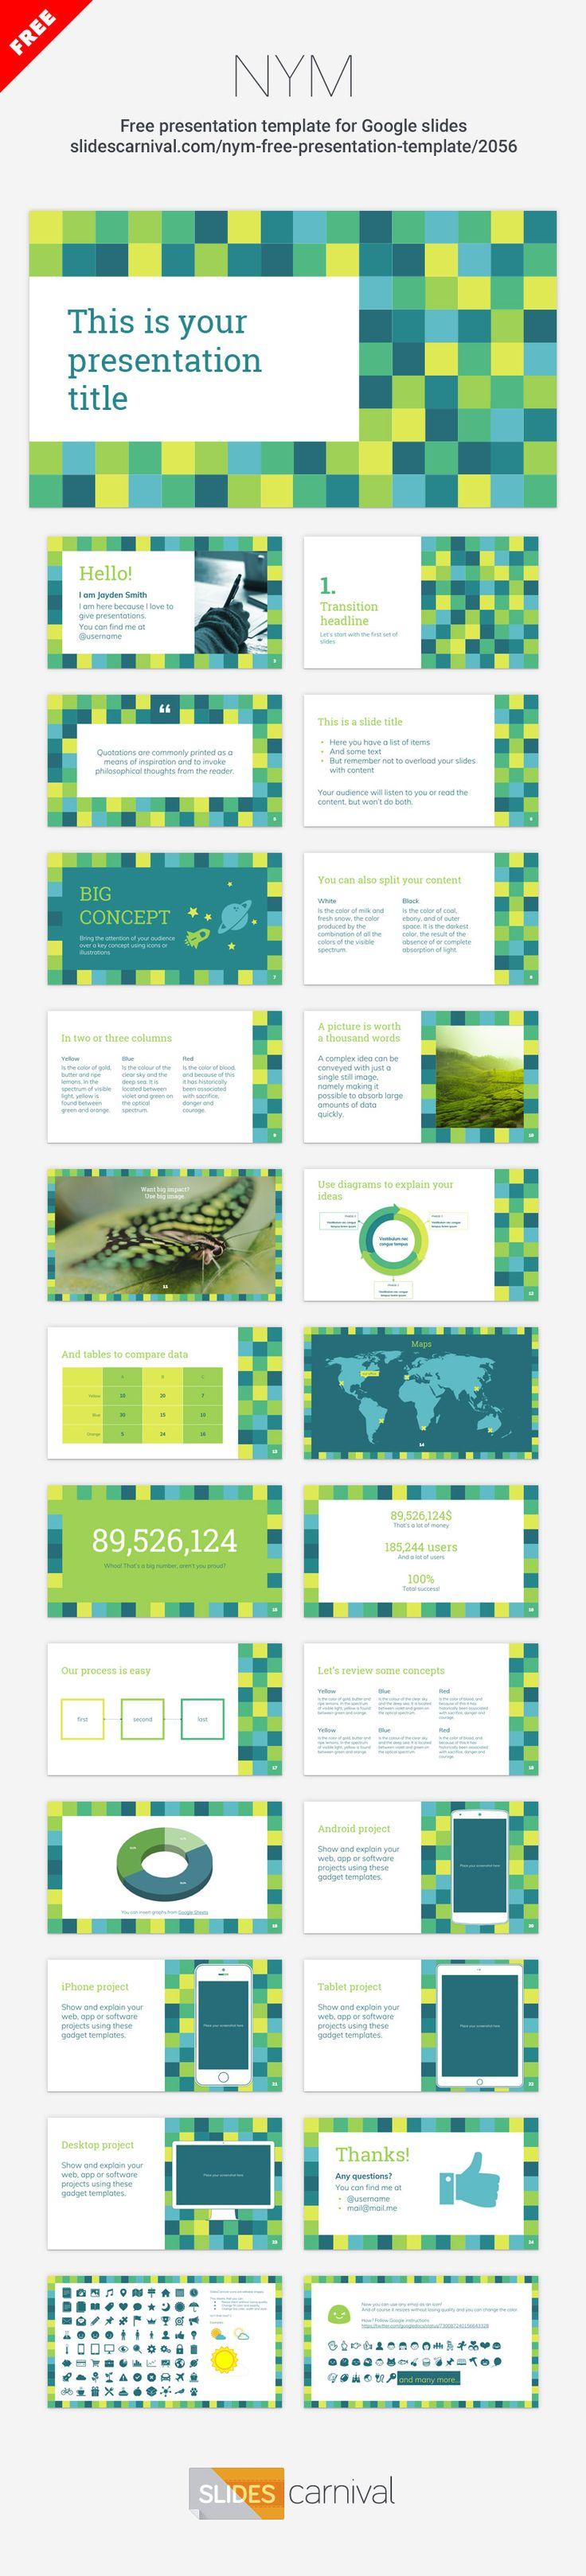 best 25+ free presentation templates ideas on pinterest | free, Presentation templates